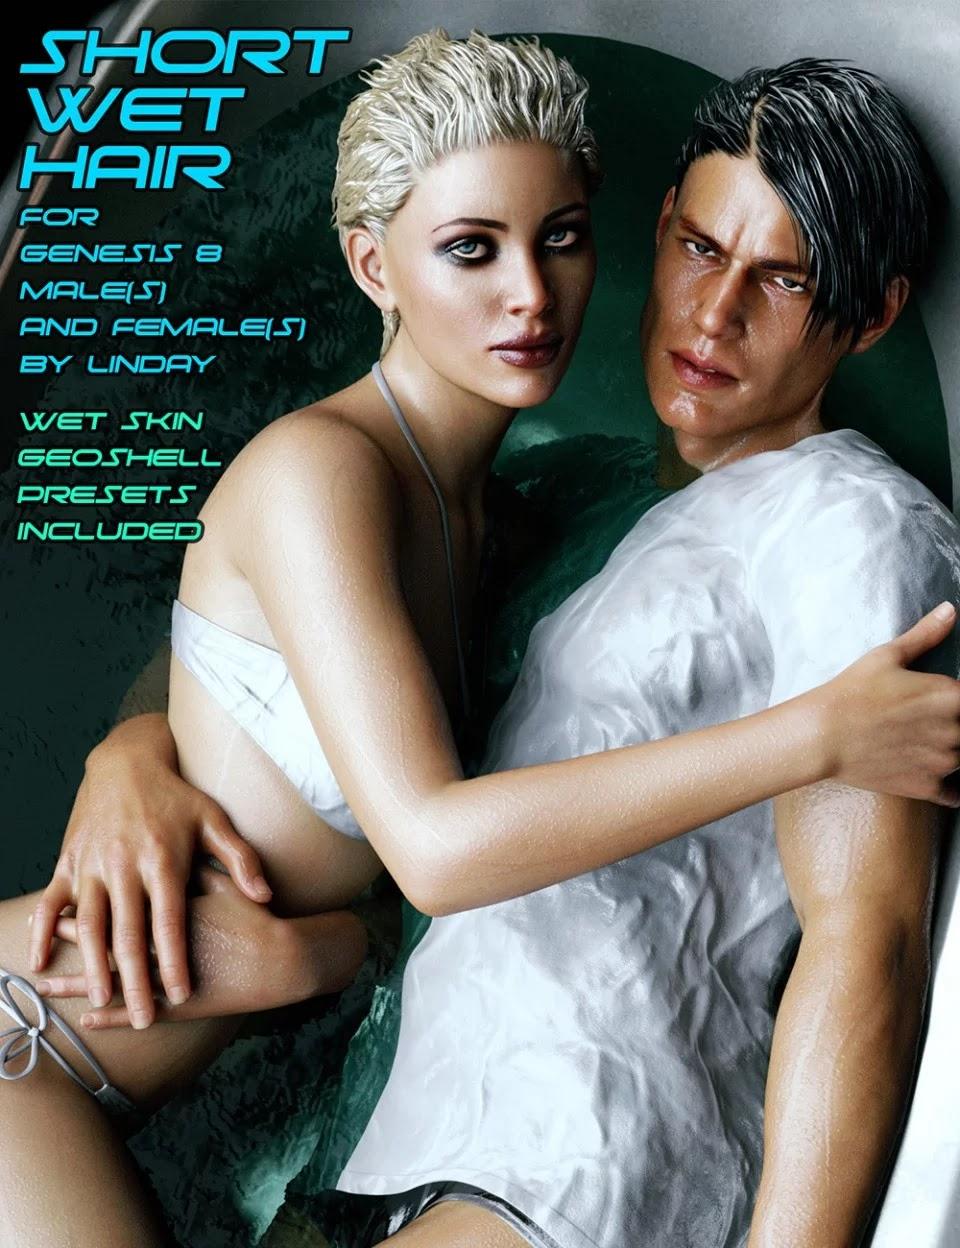 Short Wet Hair for Genesis 8 Male(s) and Female(s)_DAZ3D下载站